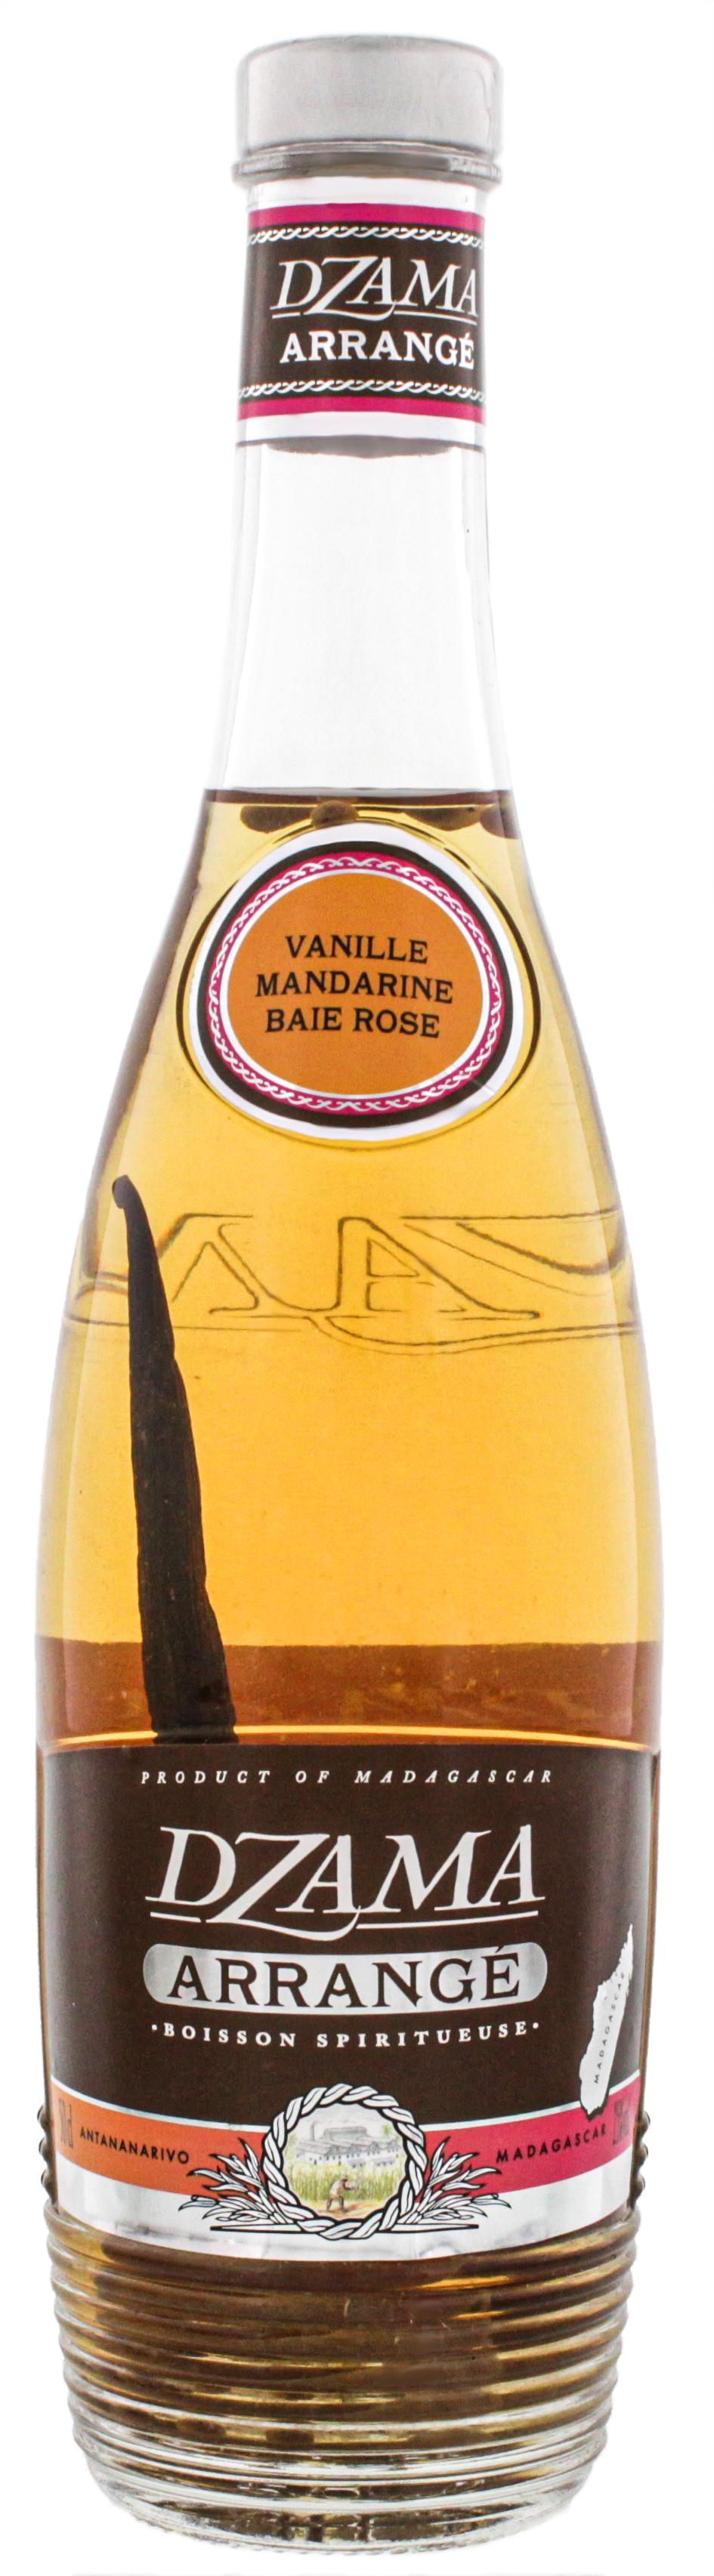 Dzama Arrange Vanille Mandarine Baie Rose 0,5L